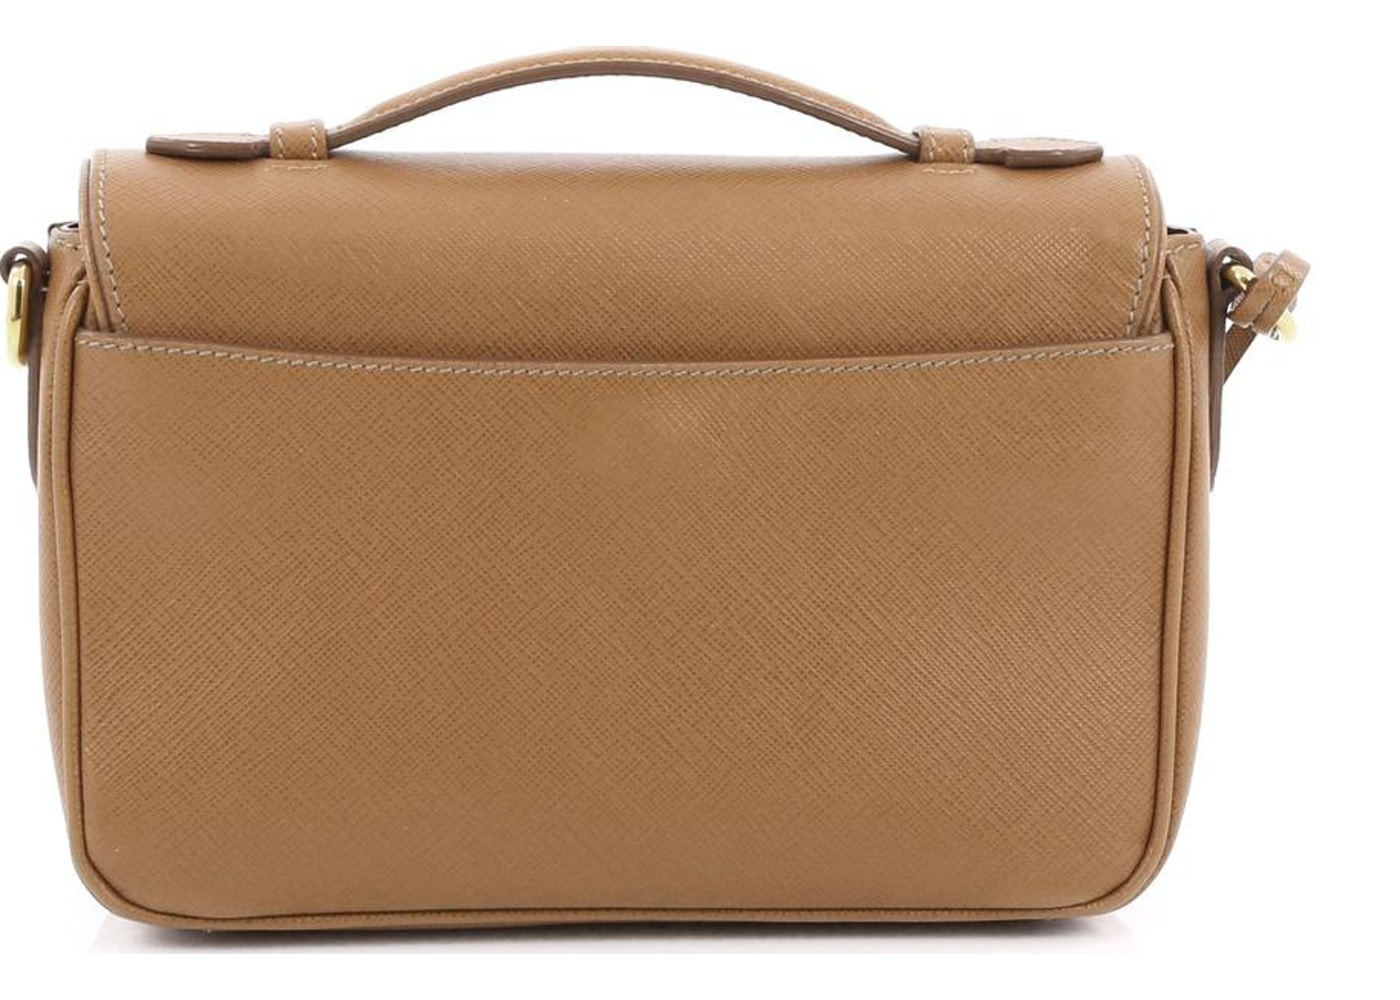 65eba3322595 Prada Sound Bag convertible Flap Vernice Saffiano Mini Light Brown